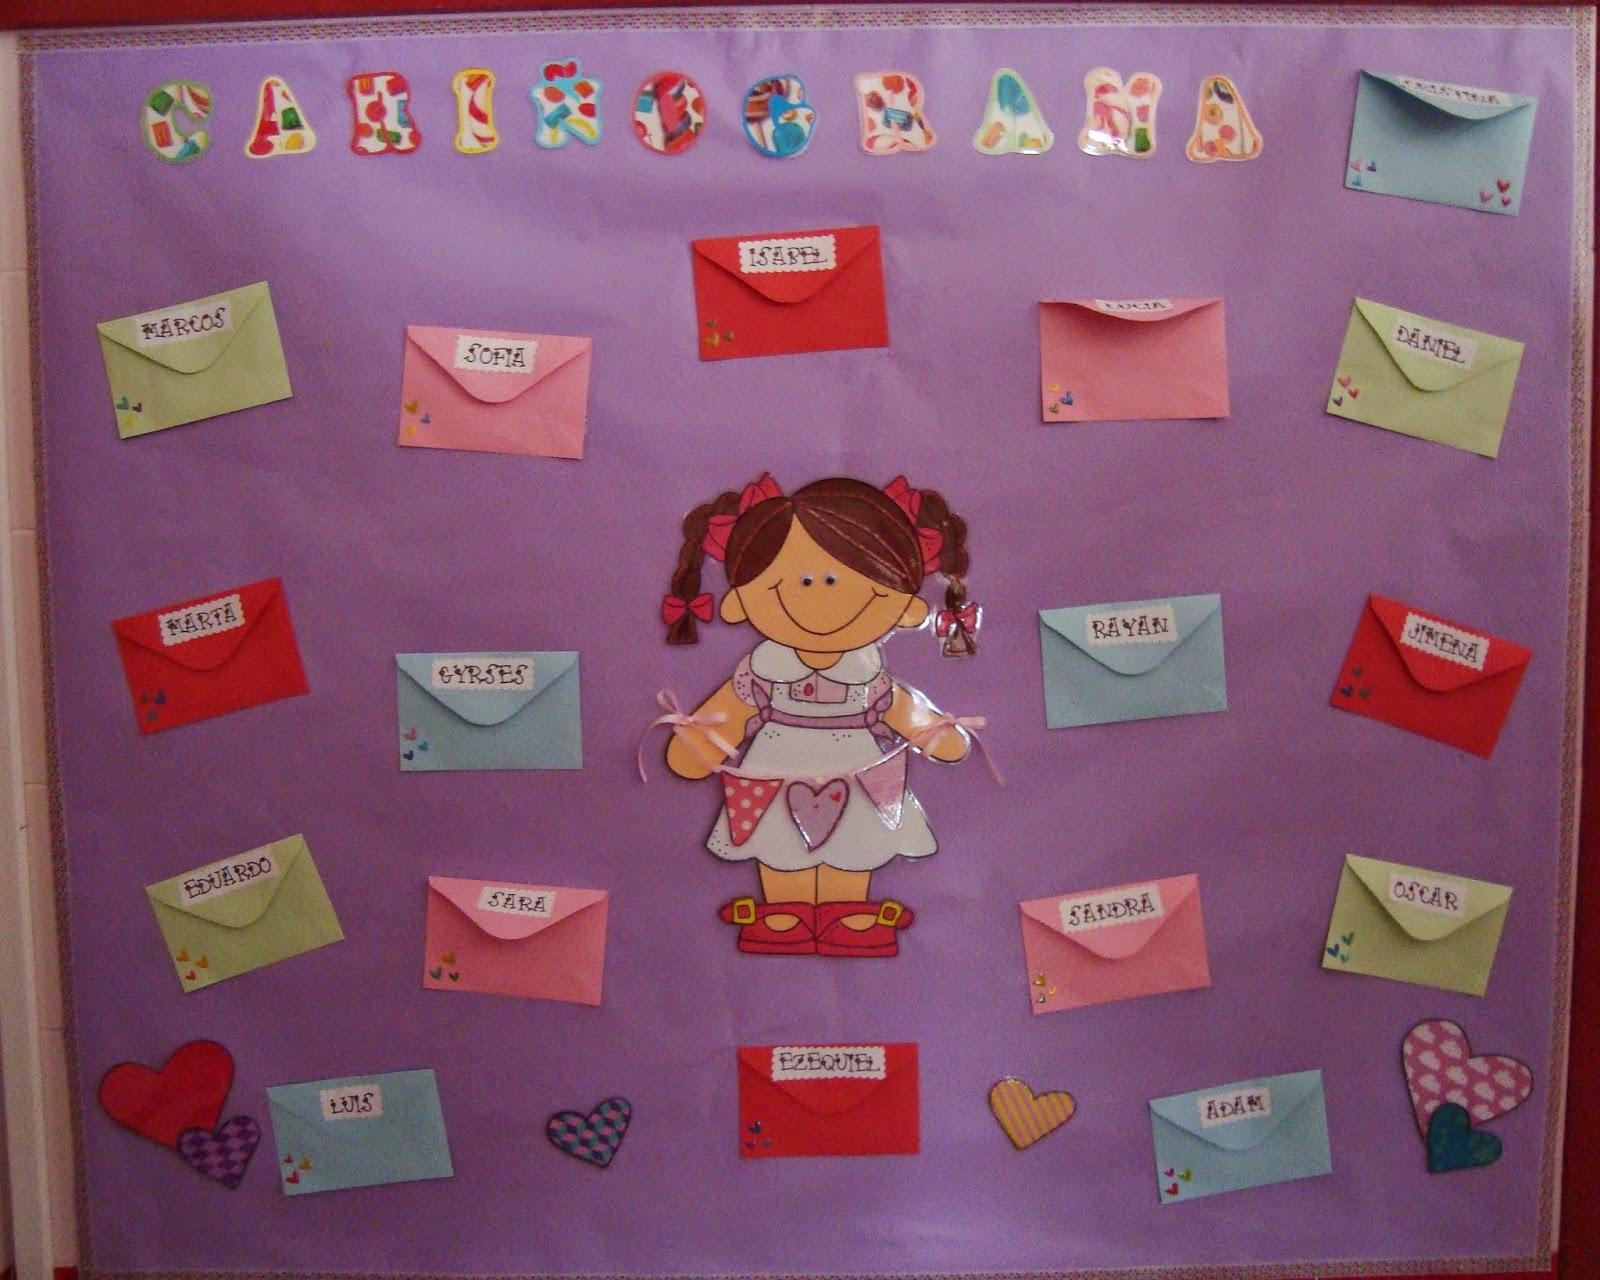 Plastificando ilusiones cari ograma for Caja de colores jardin infantil